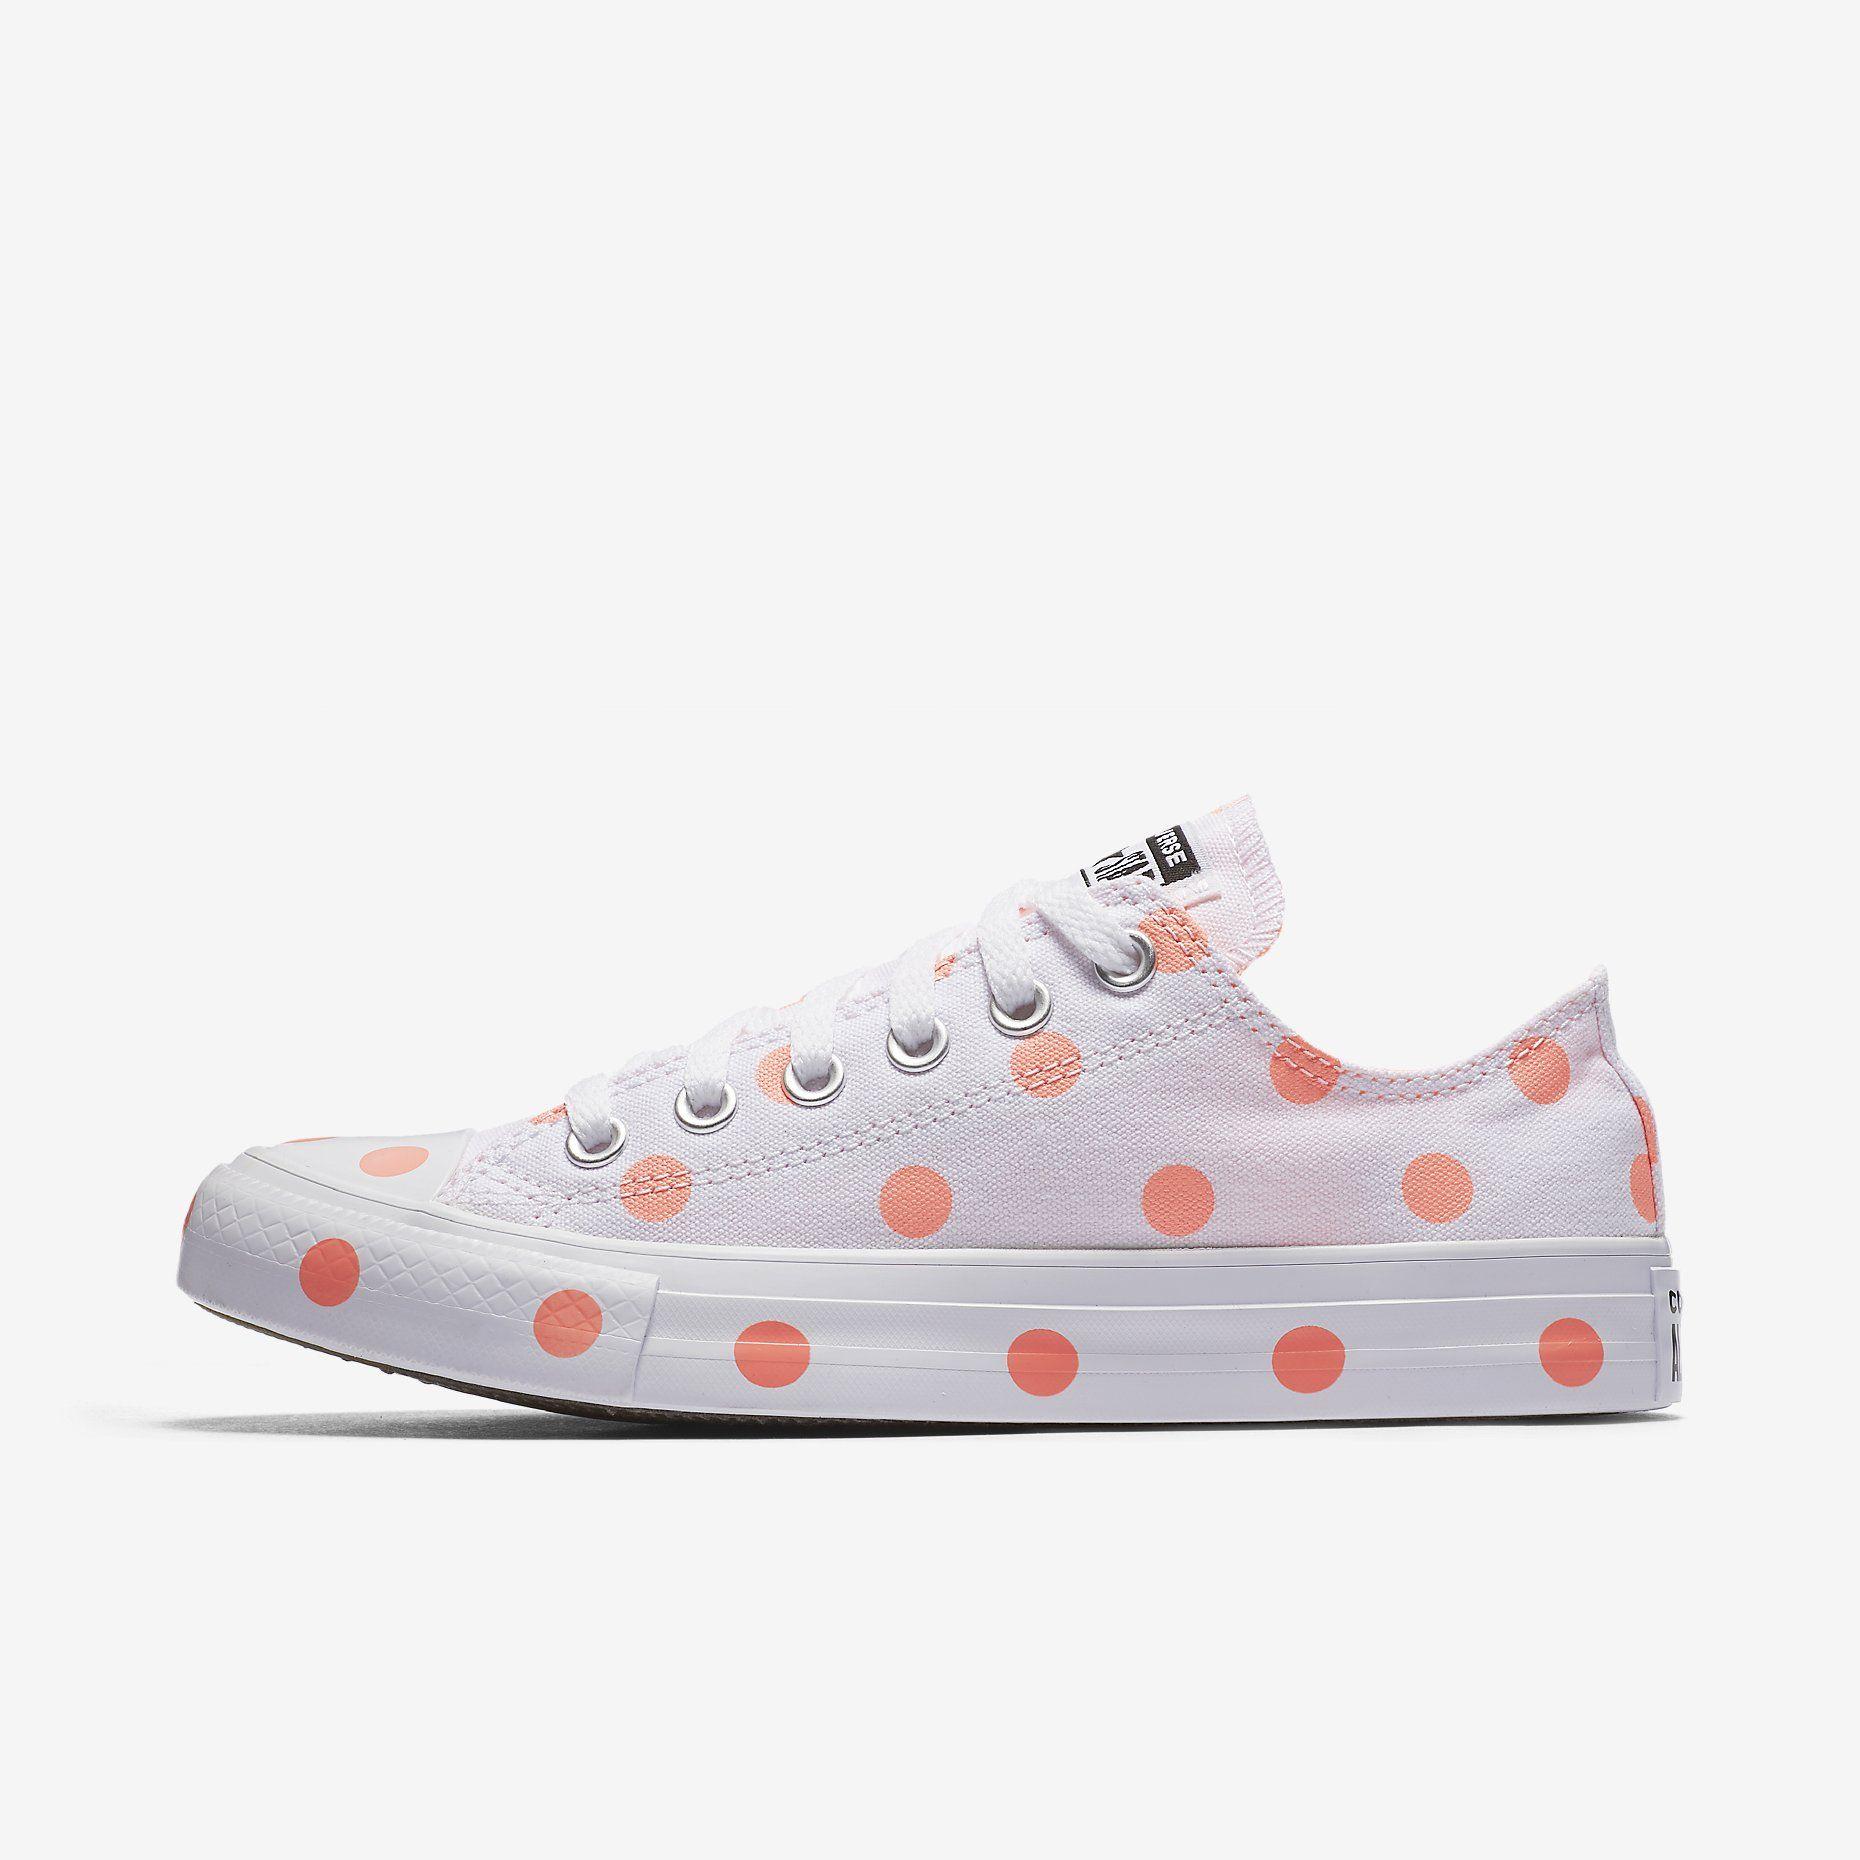 097c0c790c647b Converse Chuck Taylor All Star Polka Dots Low Top Women s Shoe. Nike ...